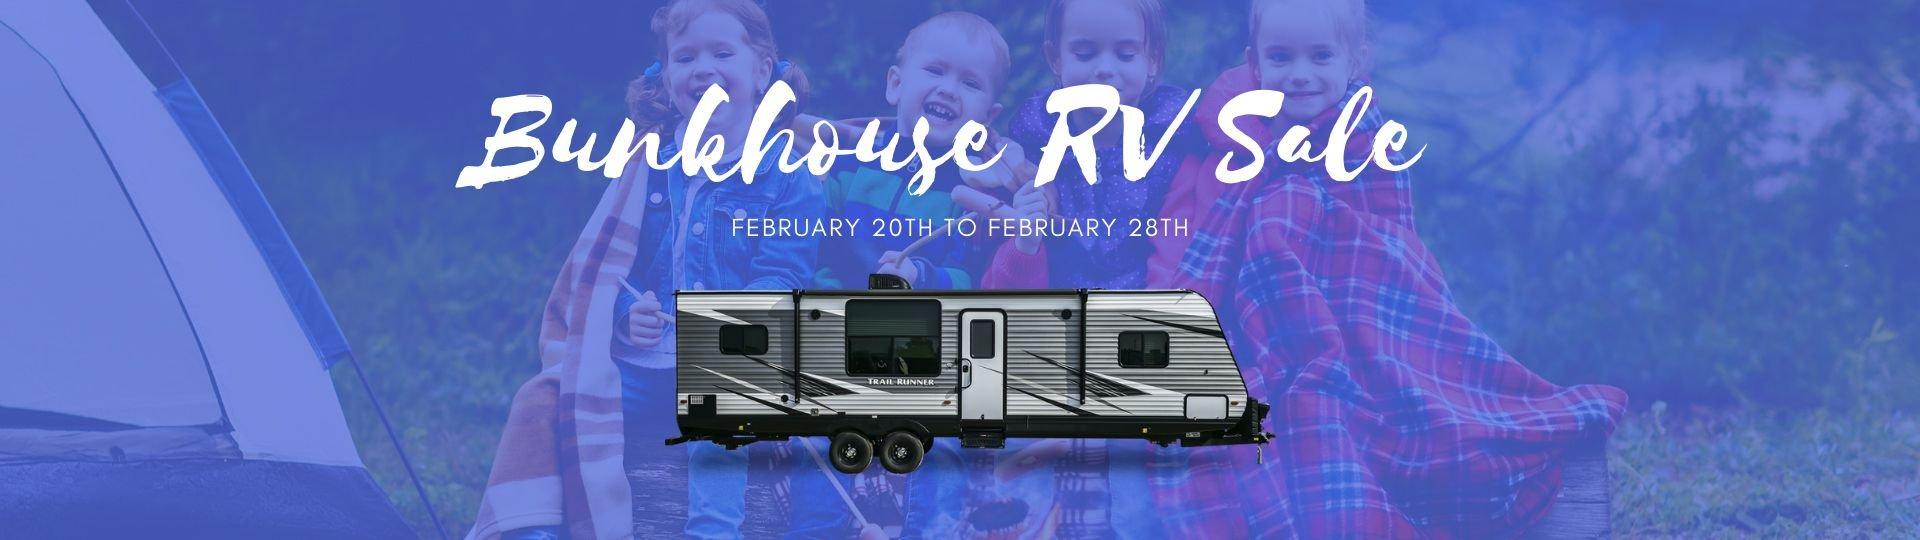 Bunkhouse Family RV Sale - Feb 20 to 28 - Slide Image